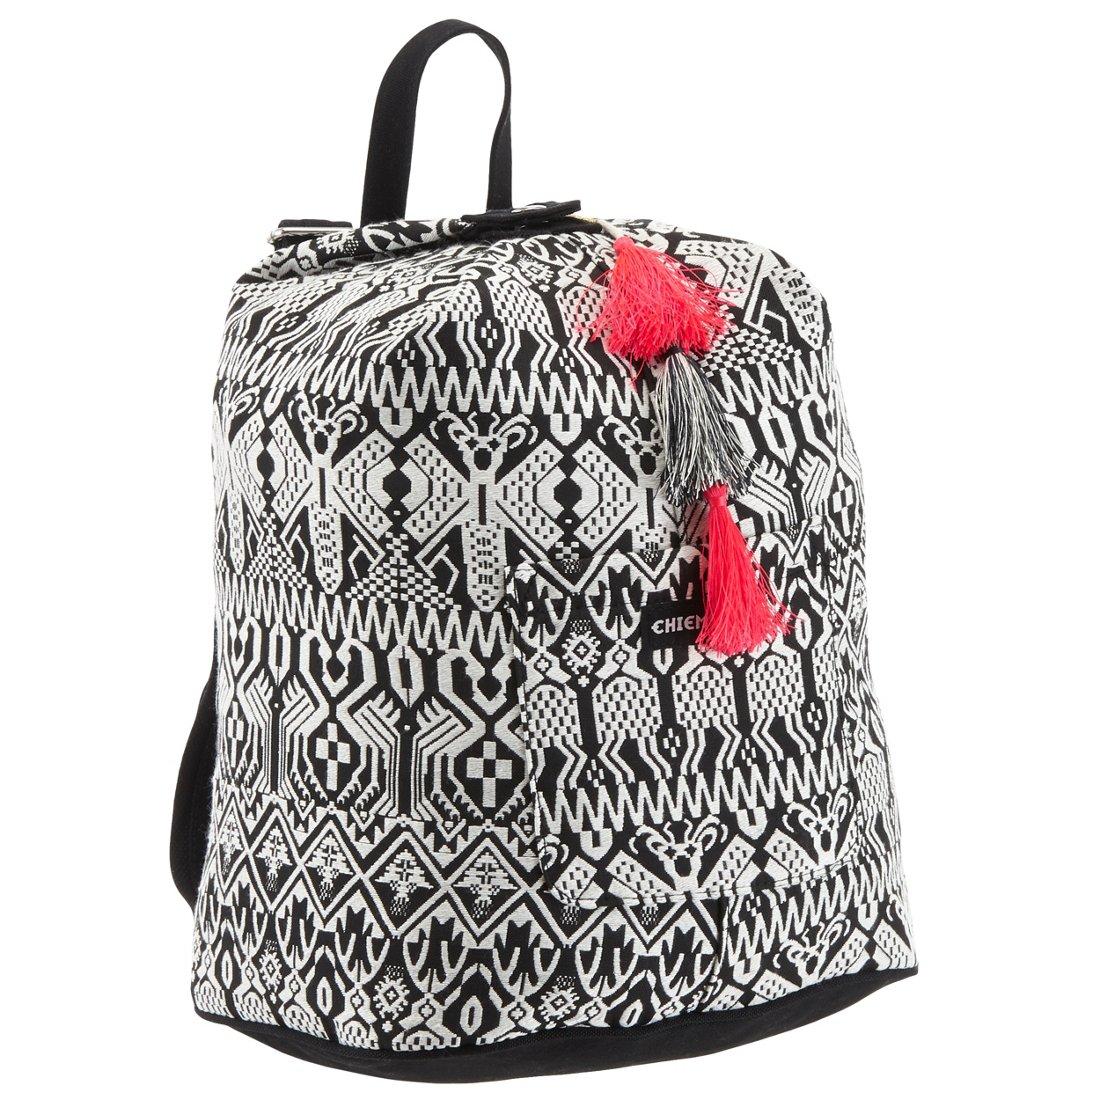 d379f8b976e99 Chiemsee Sports   Travel Bags Black   White Rucksack 41 cm - koffer -direkt.de